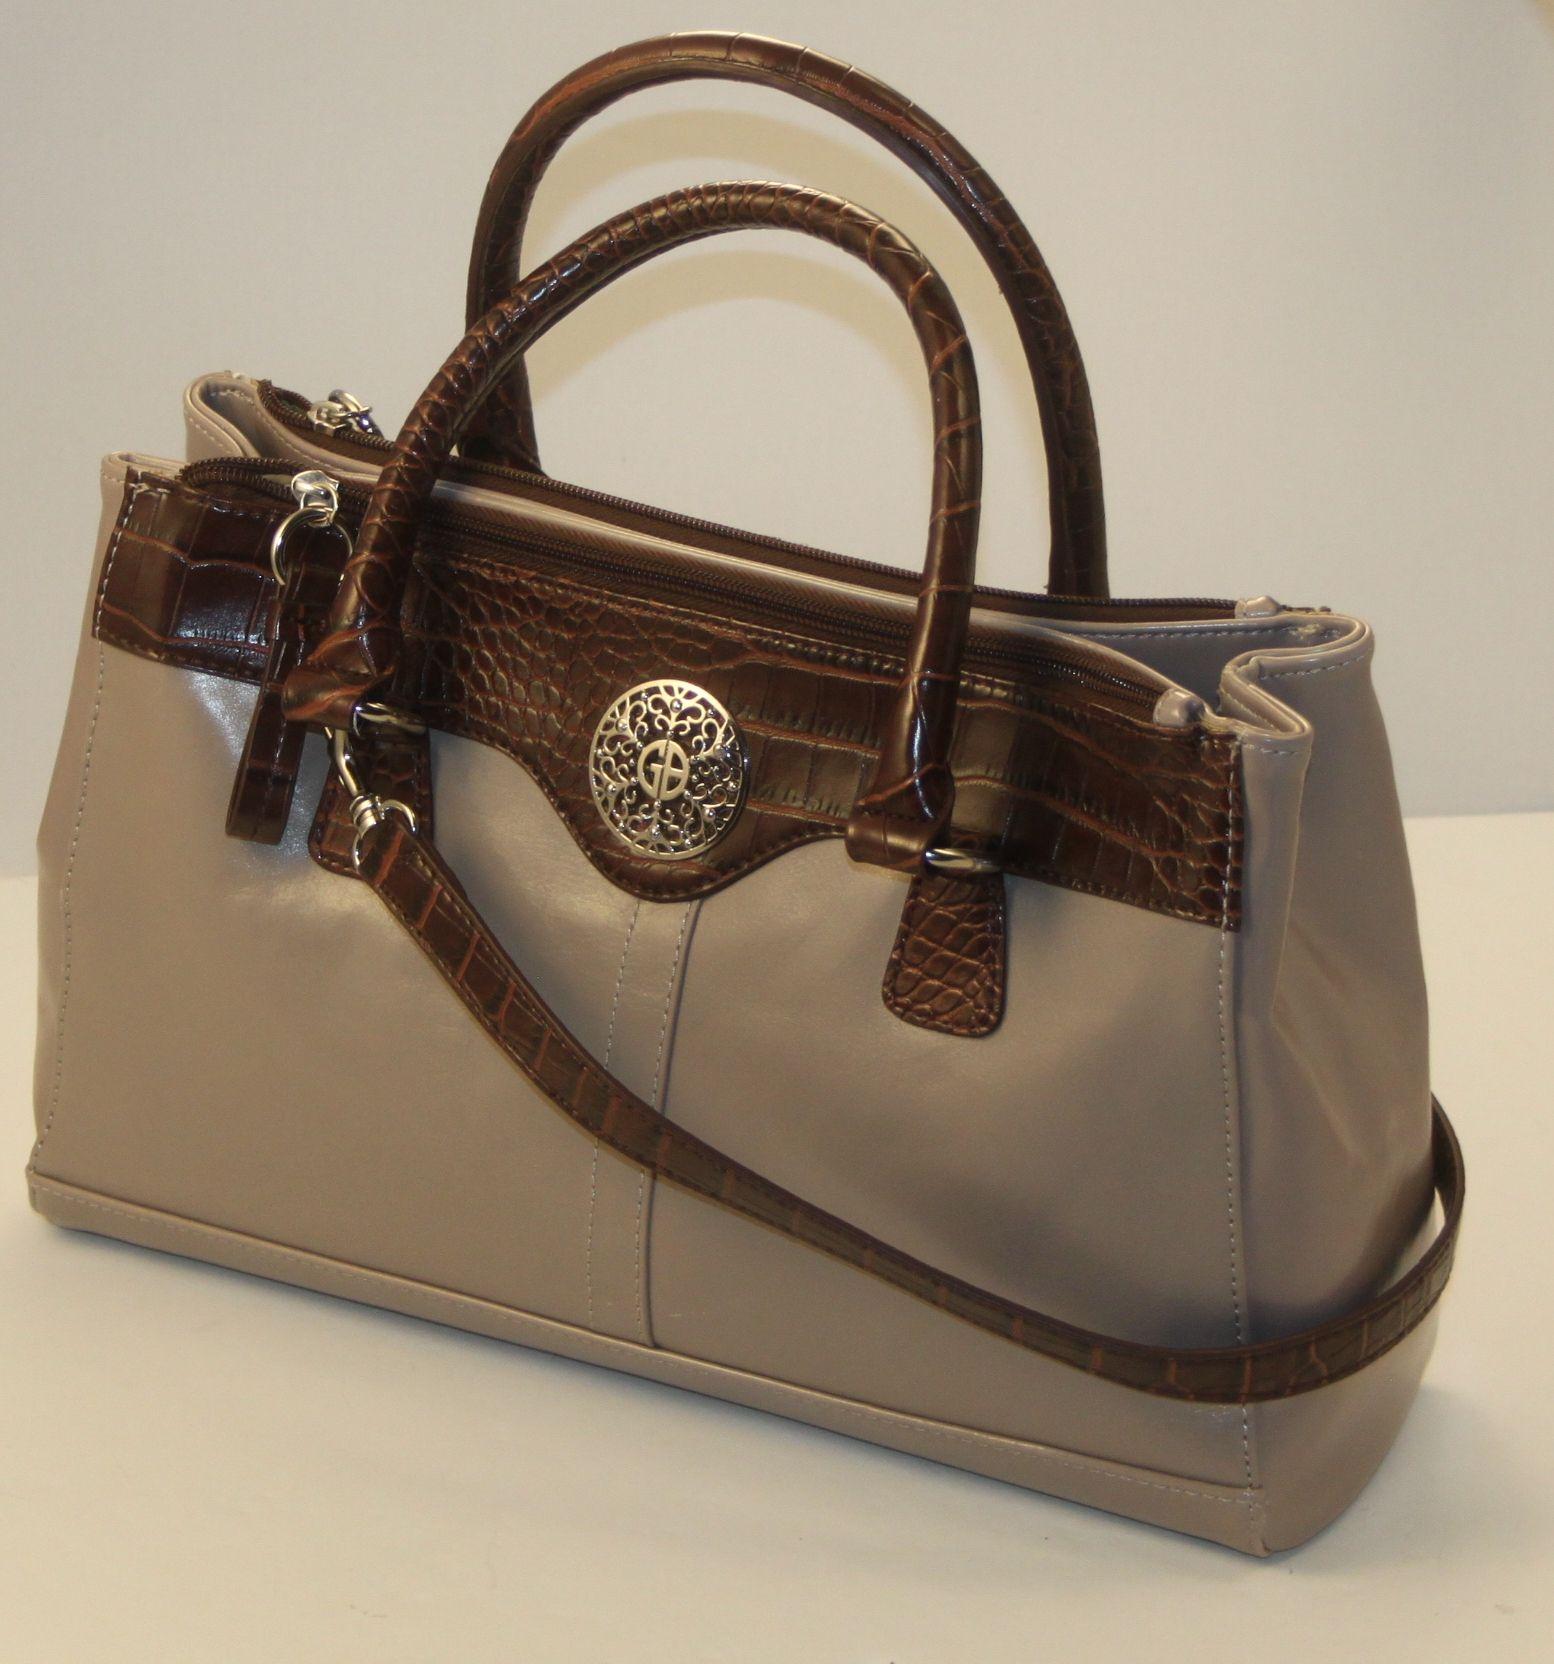 Glazed Leather Handbags Photo